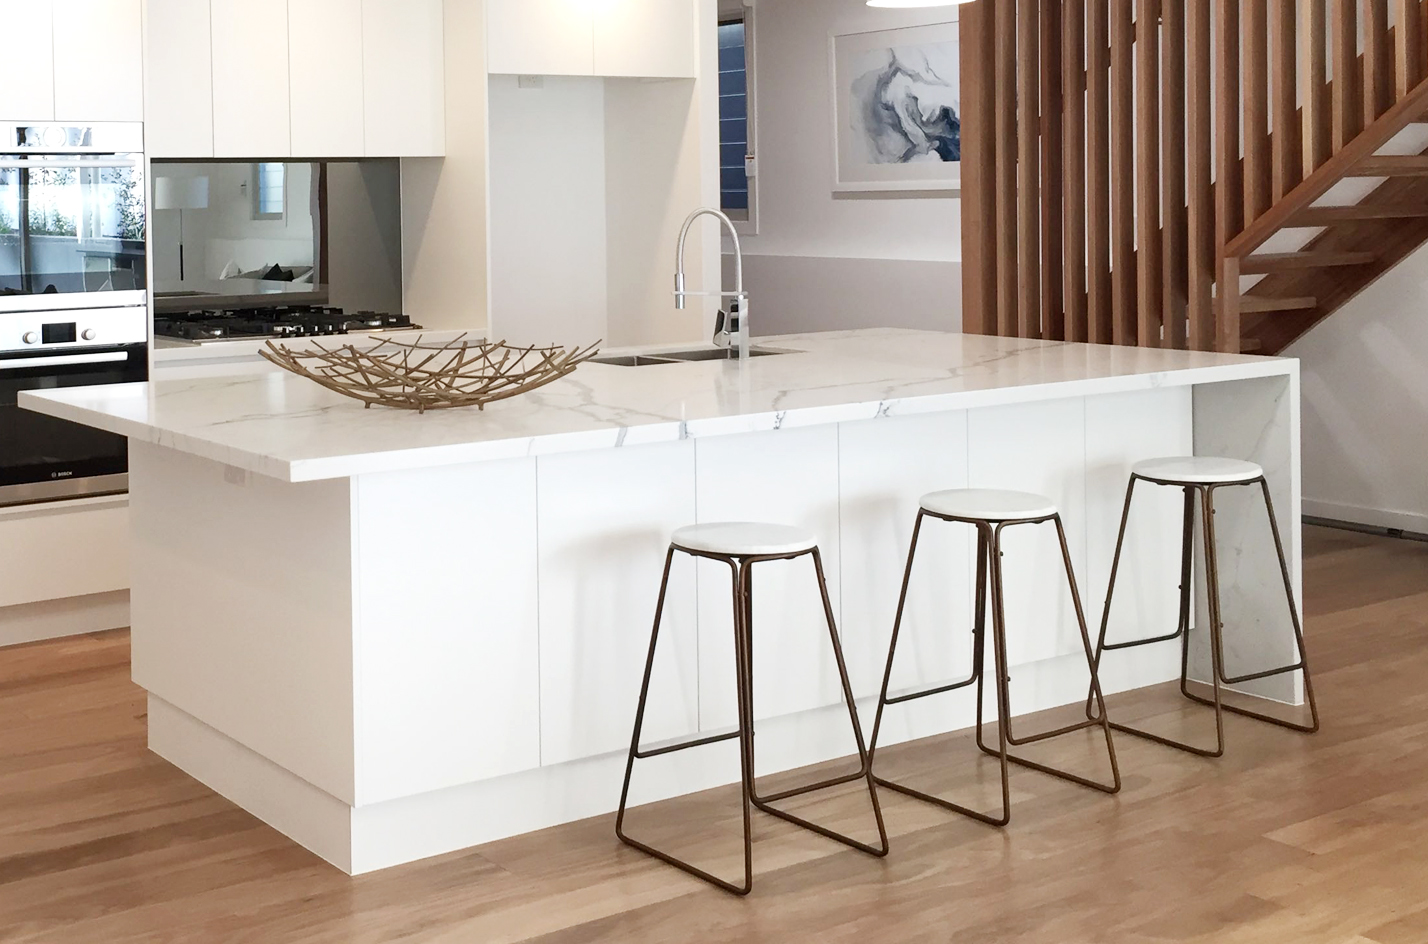 kitchen stools modern appliances mink home minkhome 2018 07 11t14 46 33 00